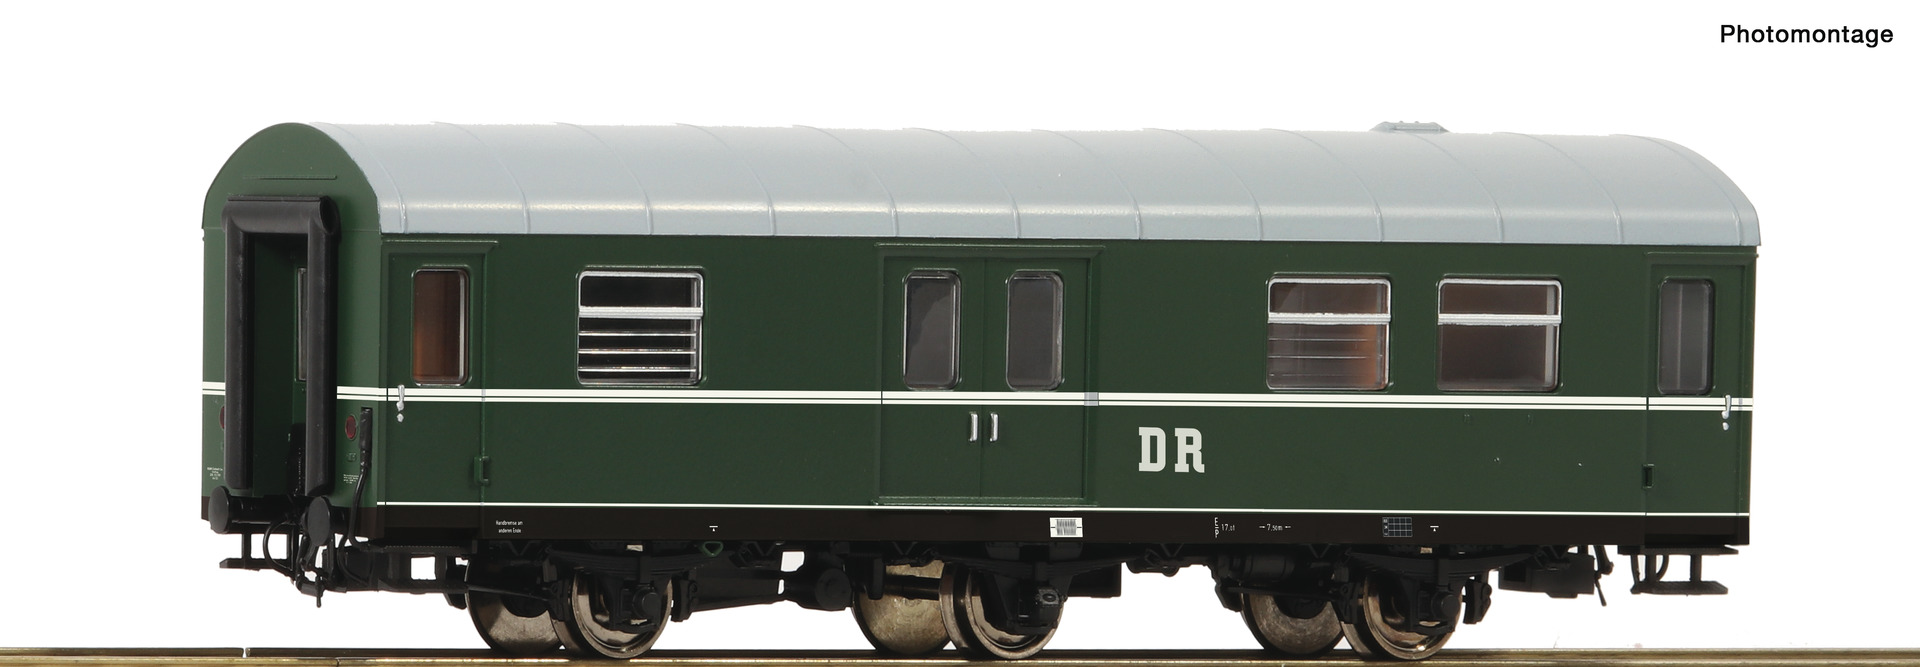 Roco 74462  Rekowagen 3a. Gepäckwagen DR  EP III DC